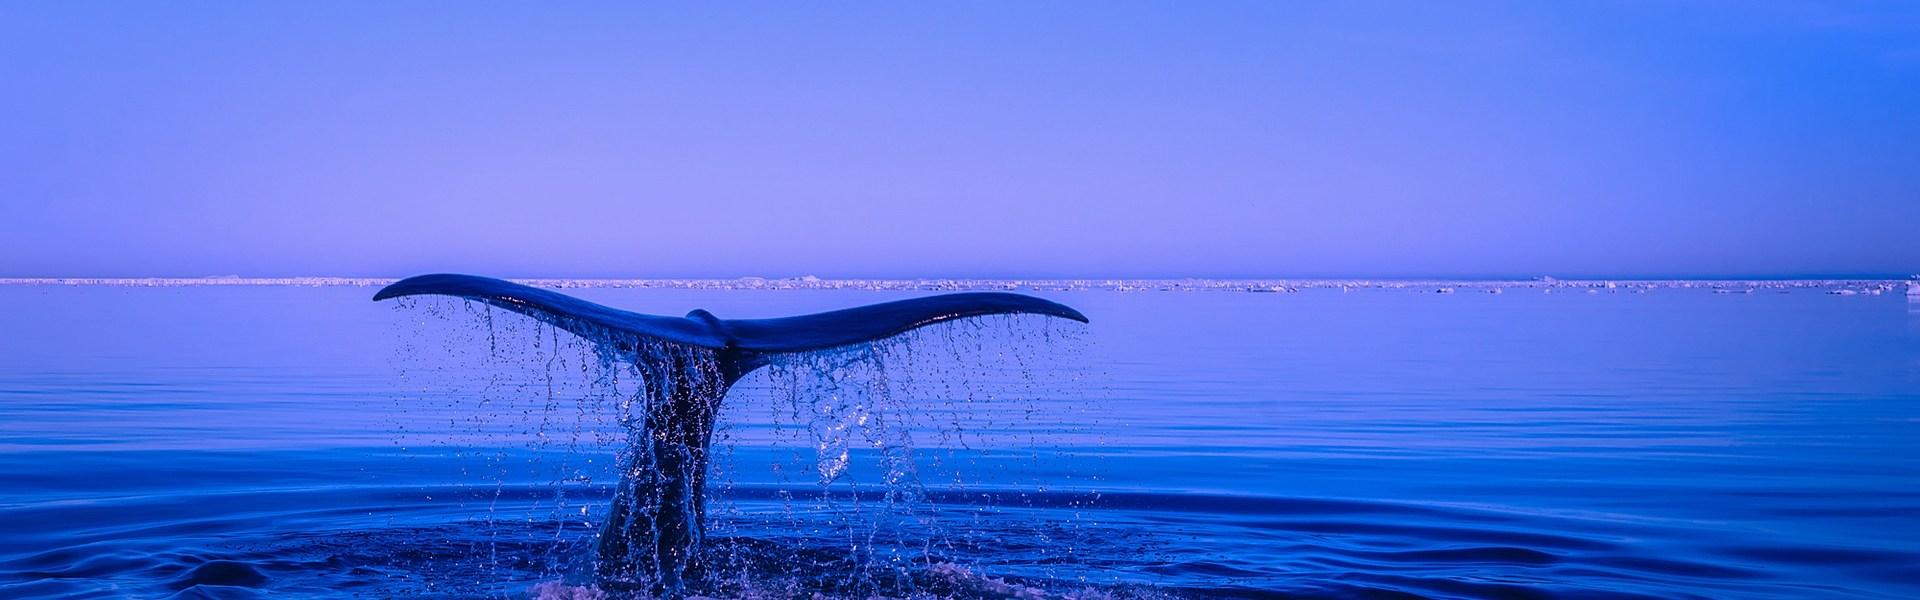 La chasse à la baleine en Islande